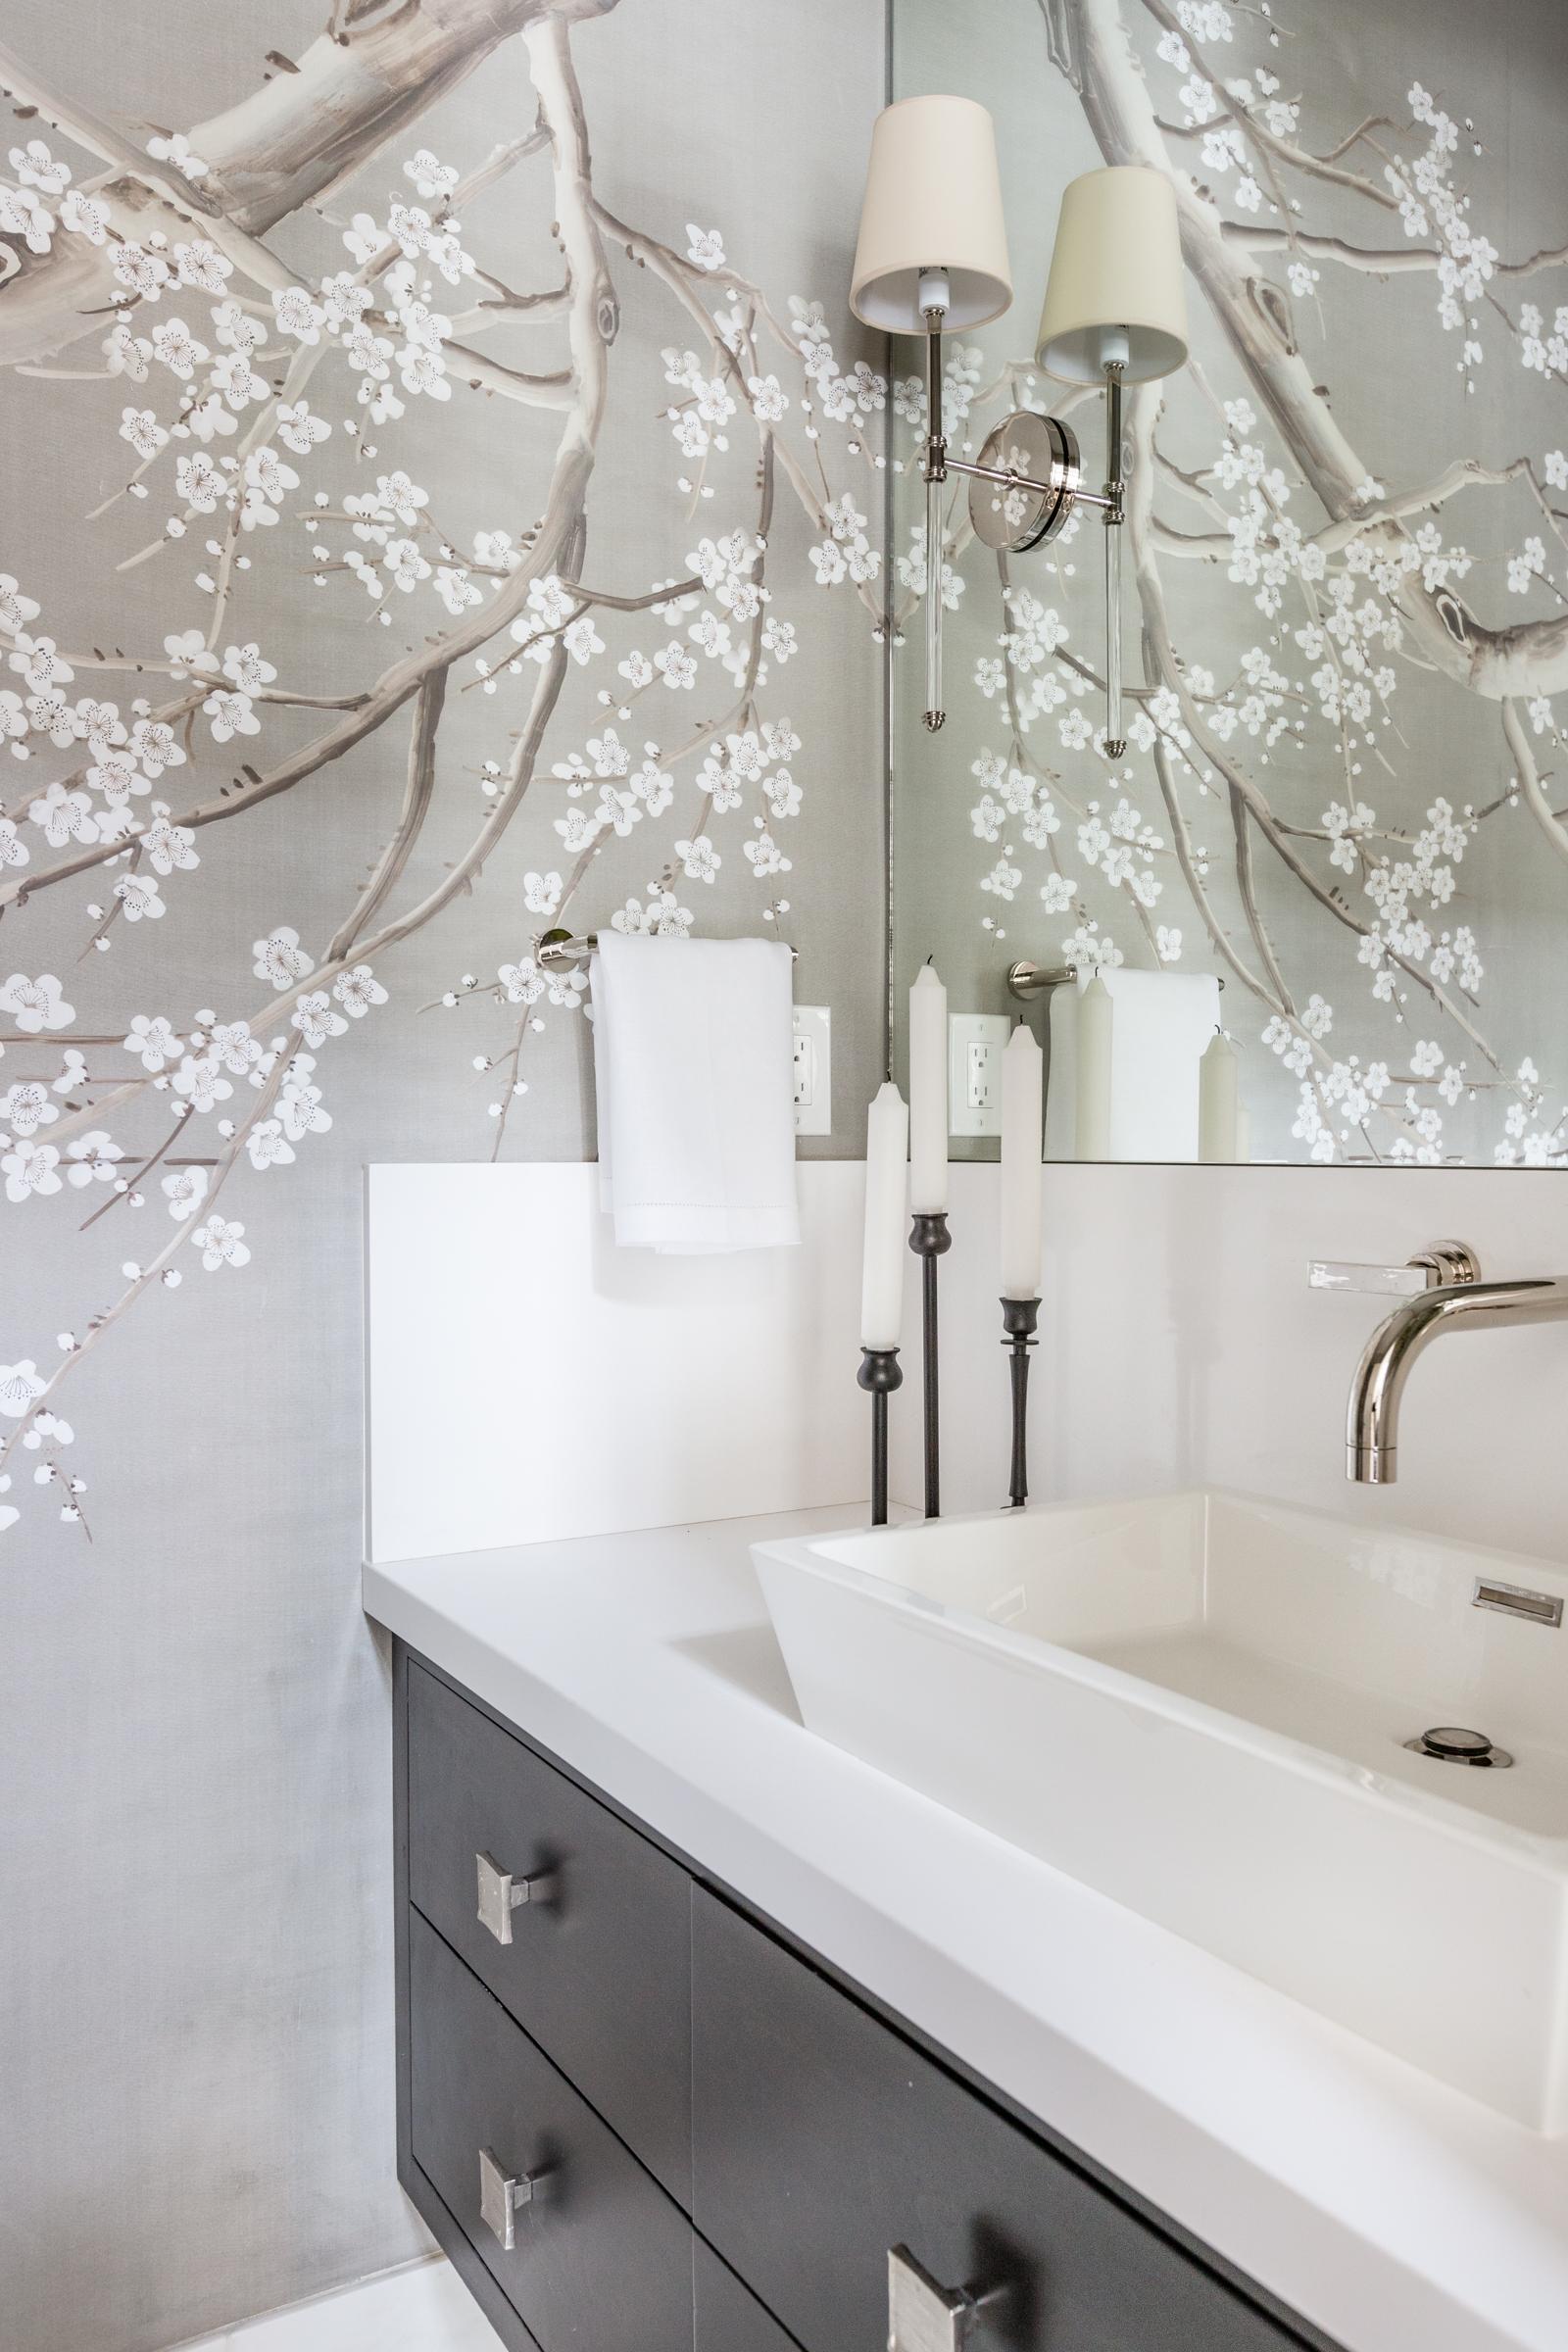 celeste_bathroom-7.jpg